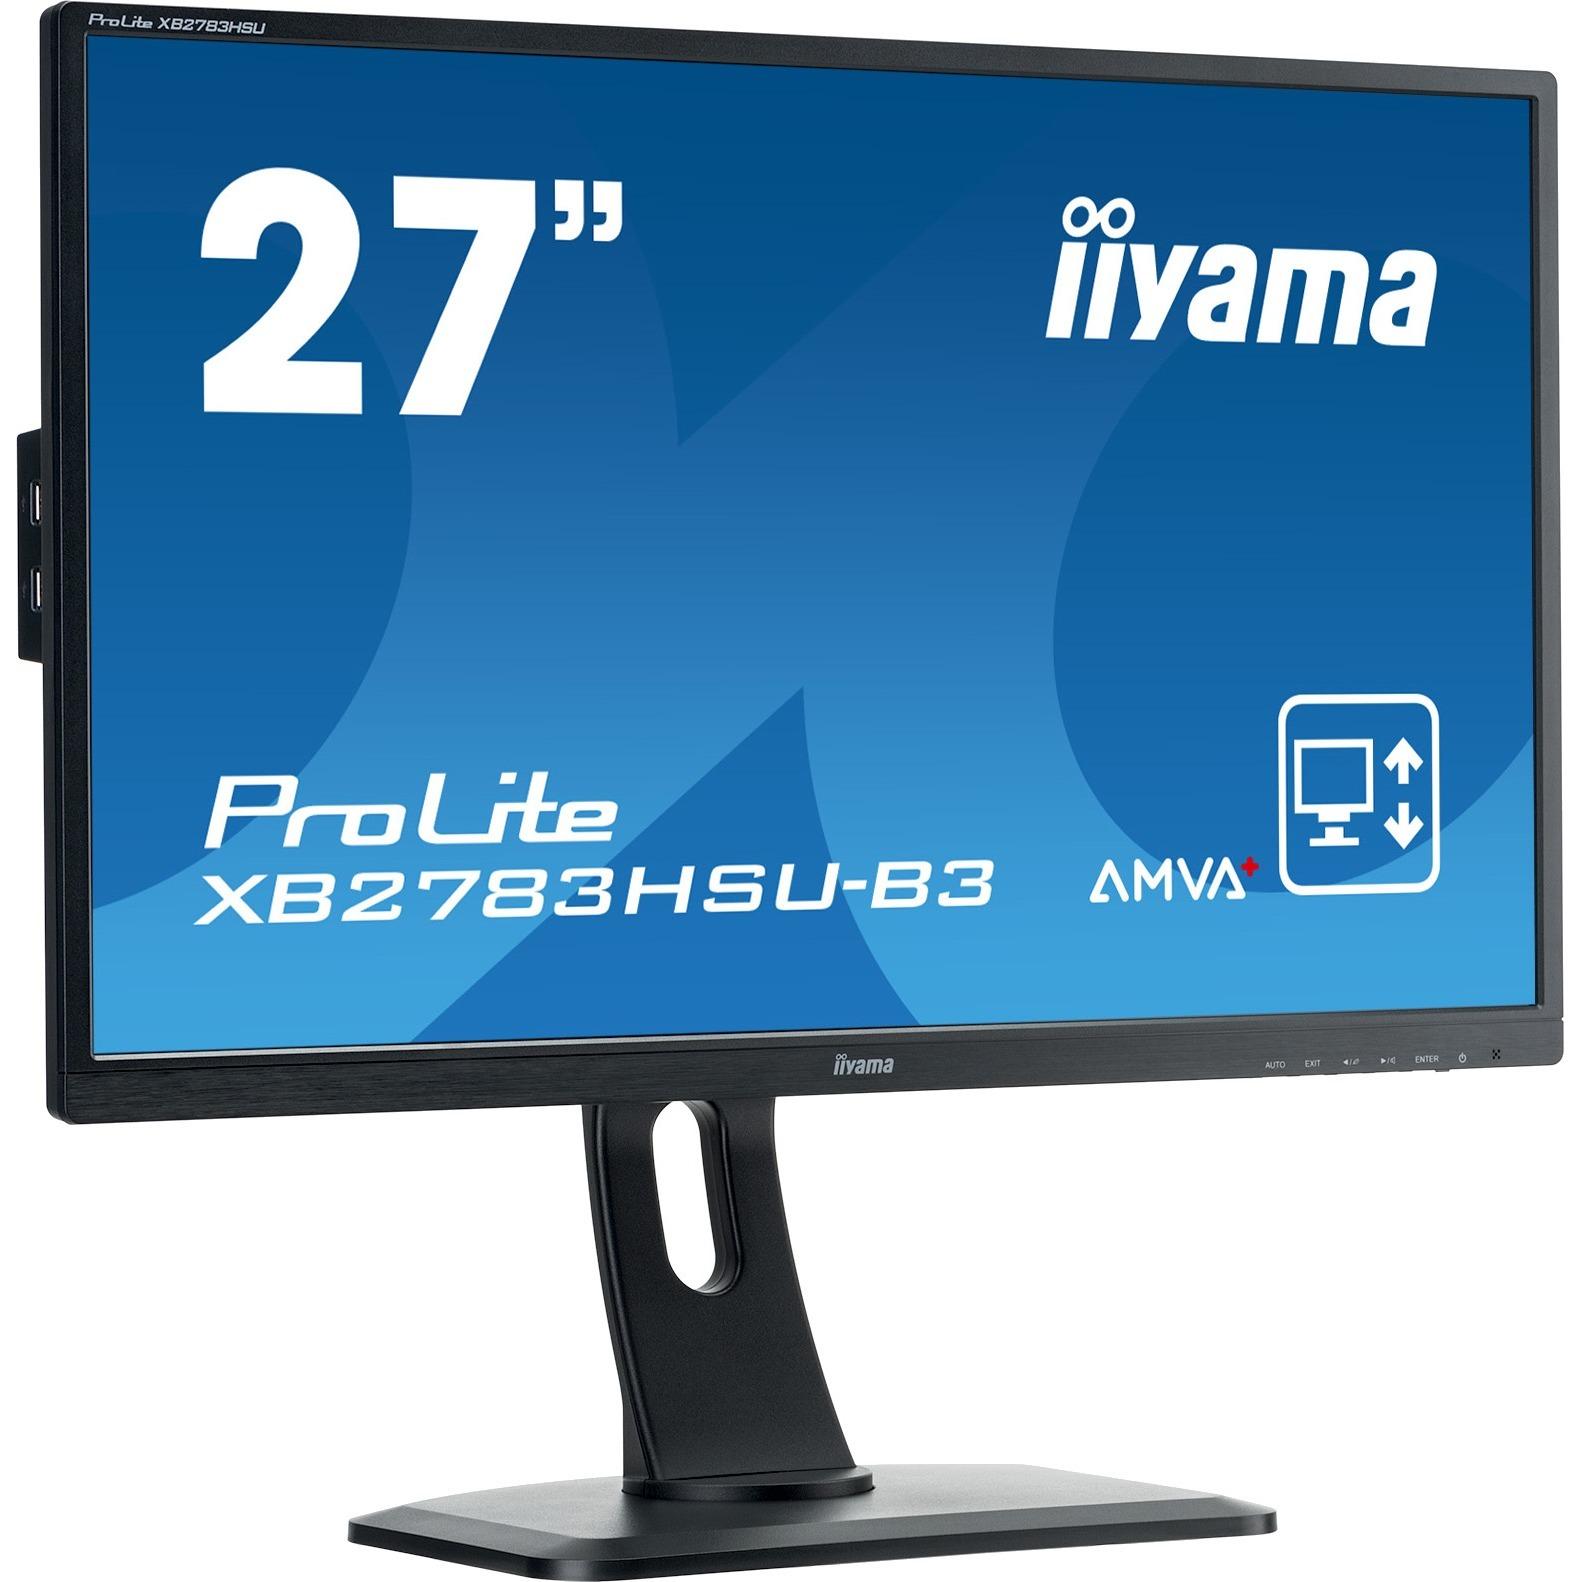 iiyama ProLite XB2783HSU-B3 27inch LED Monitor - 16:9 - 4 ms